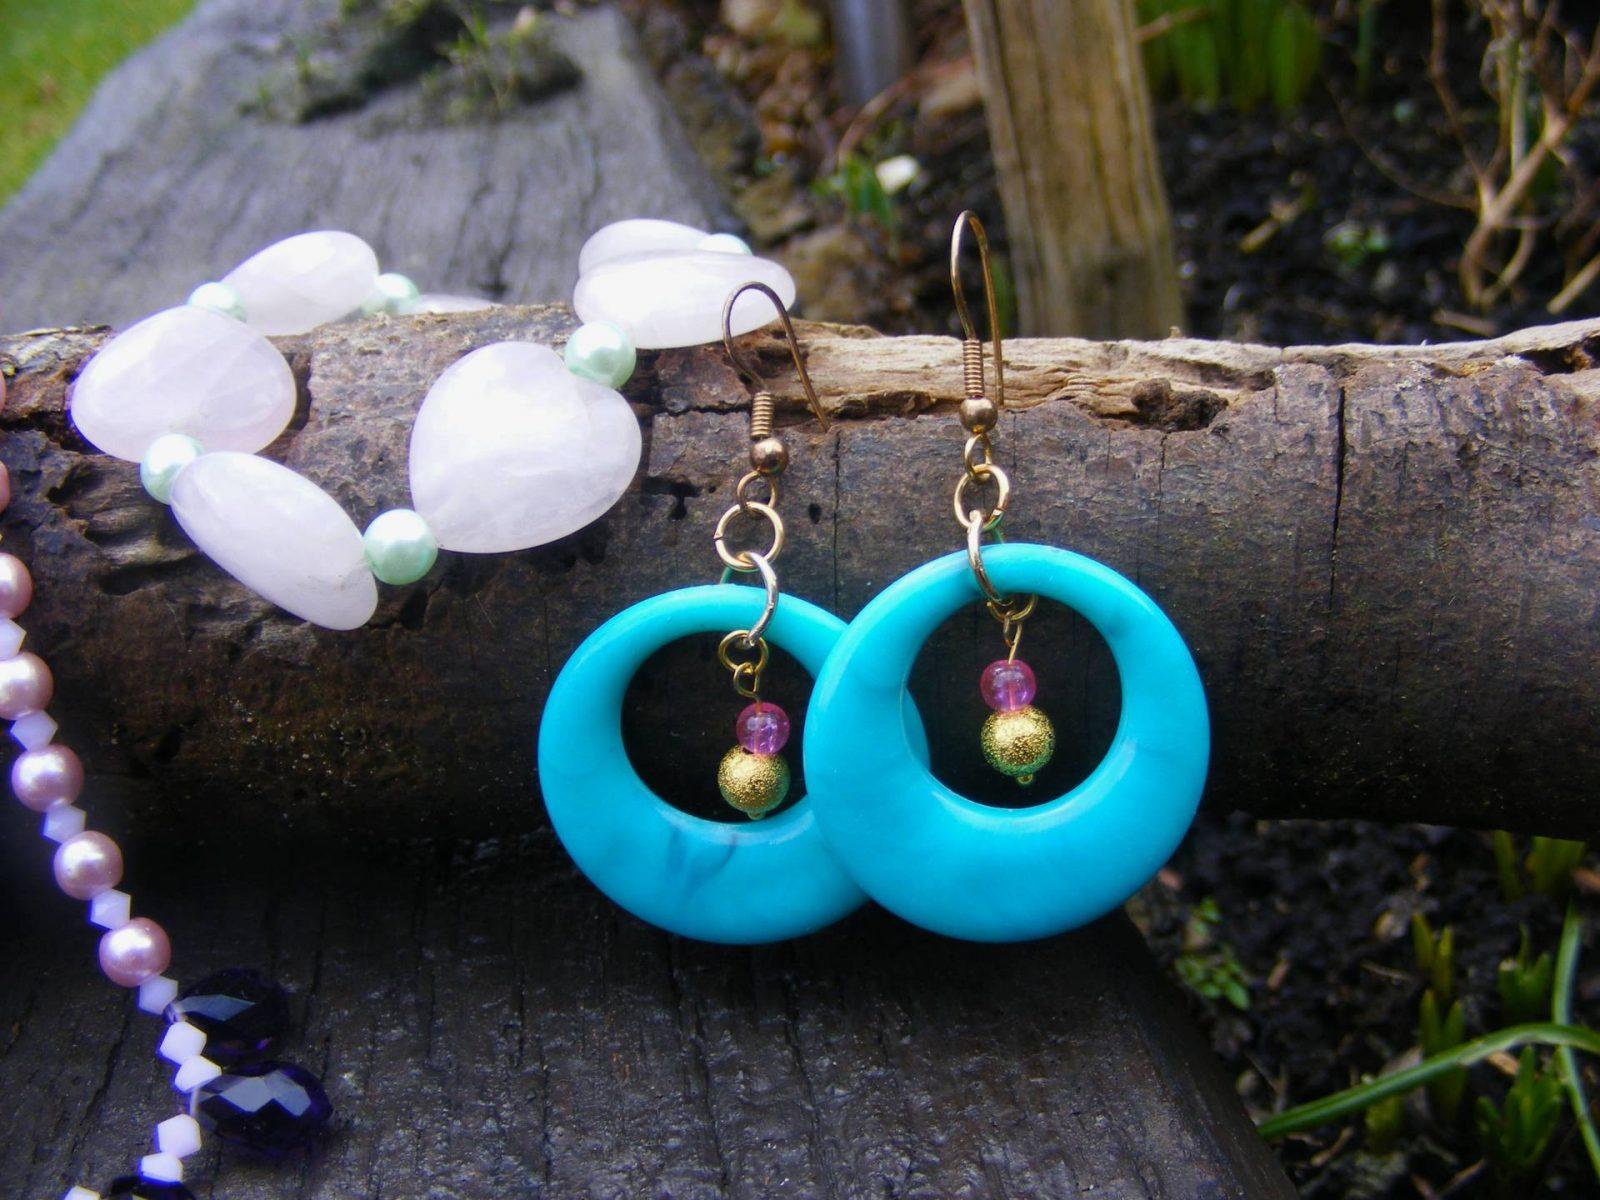 Handmade Jewellery for Spring , Turquoise earrings